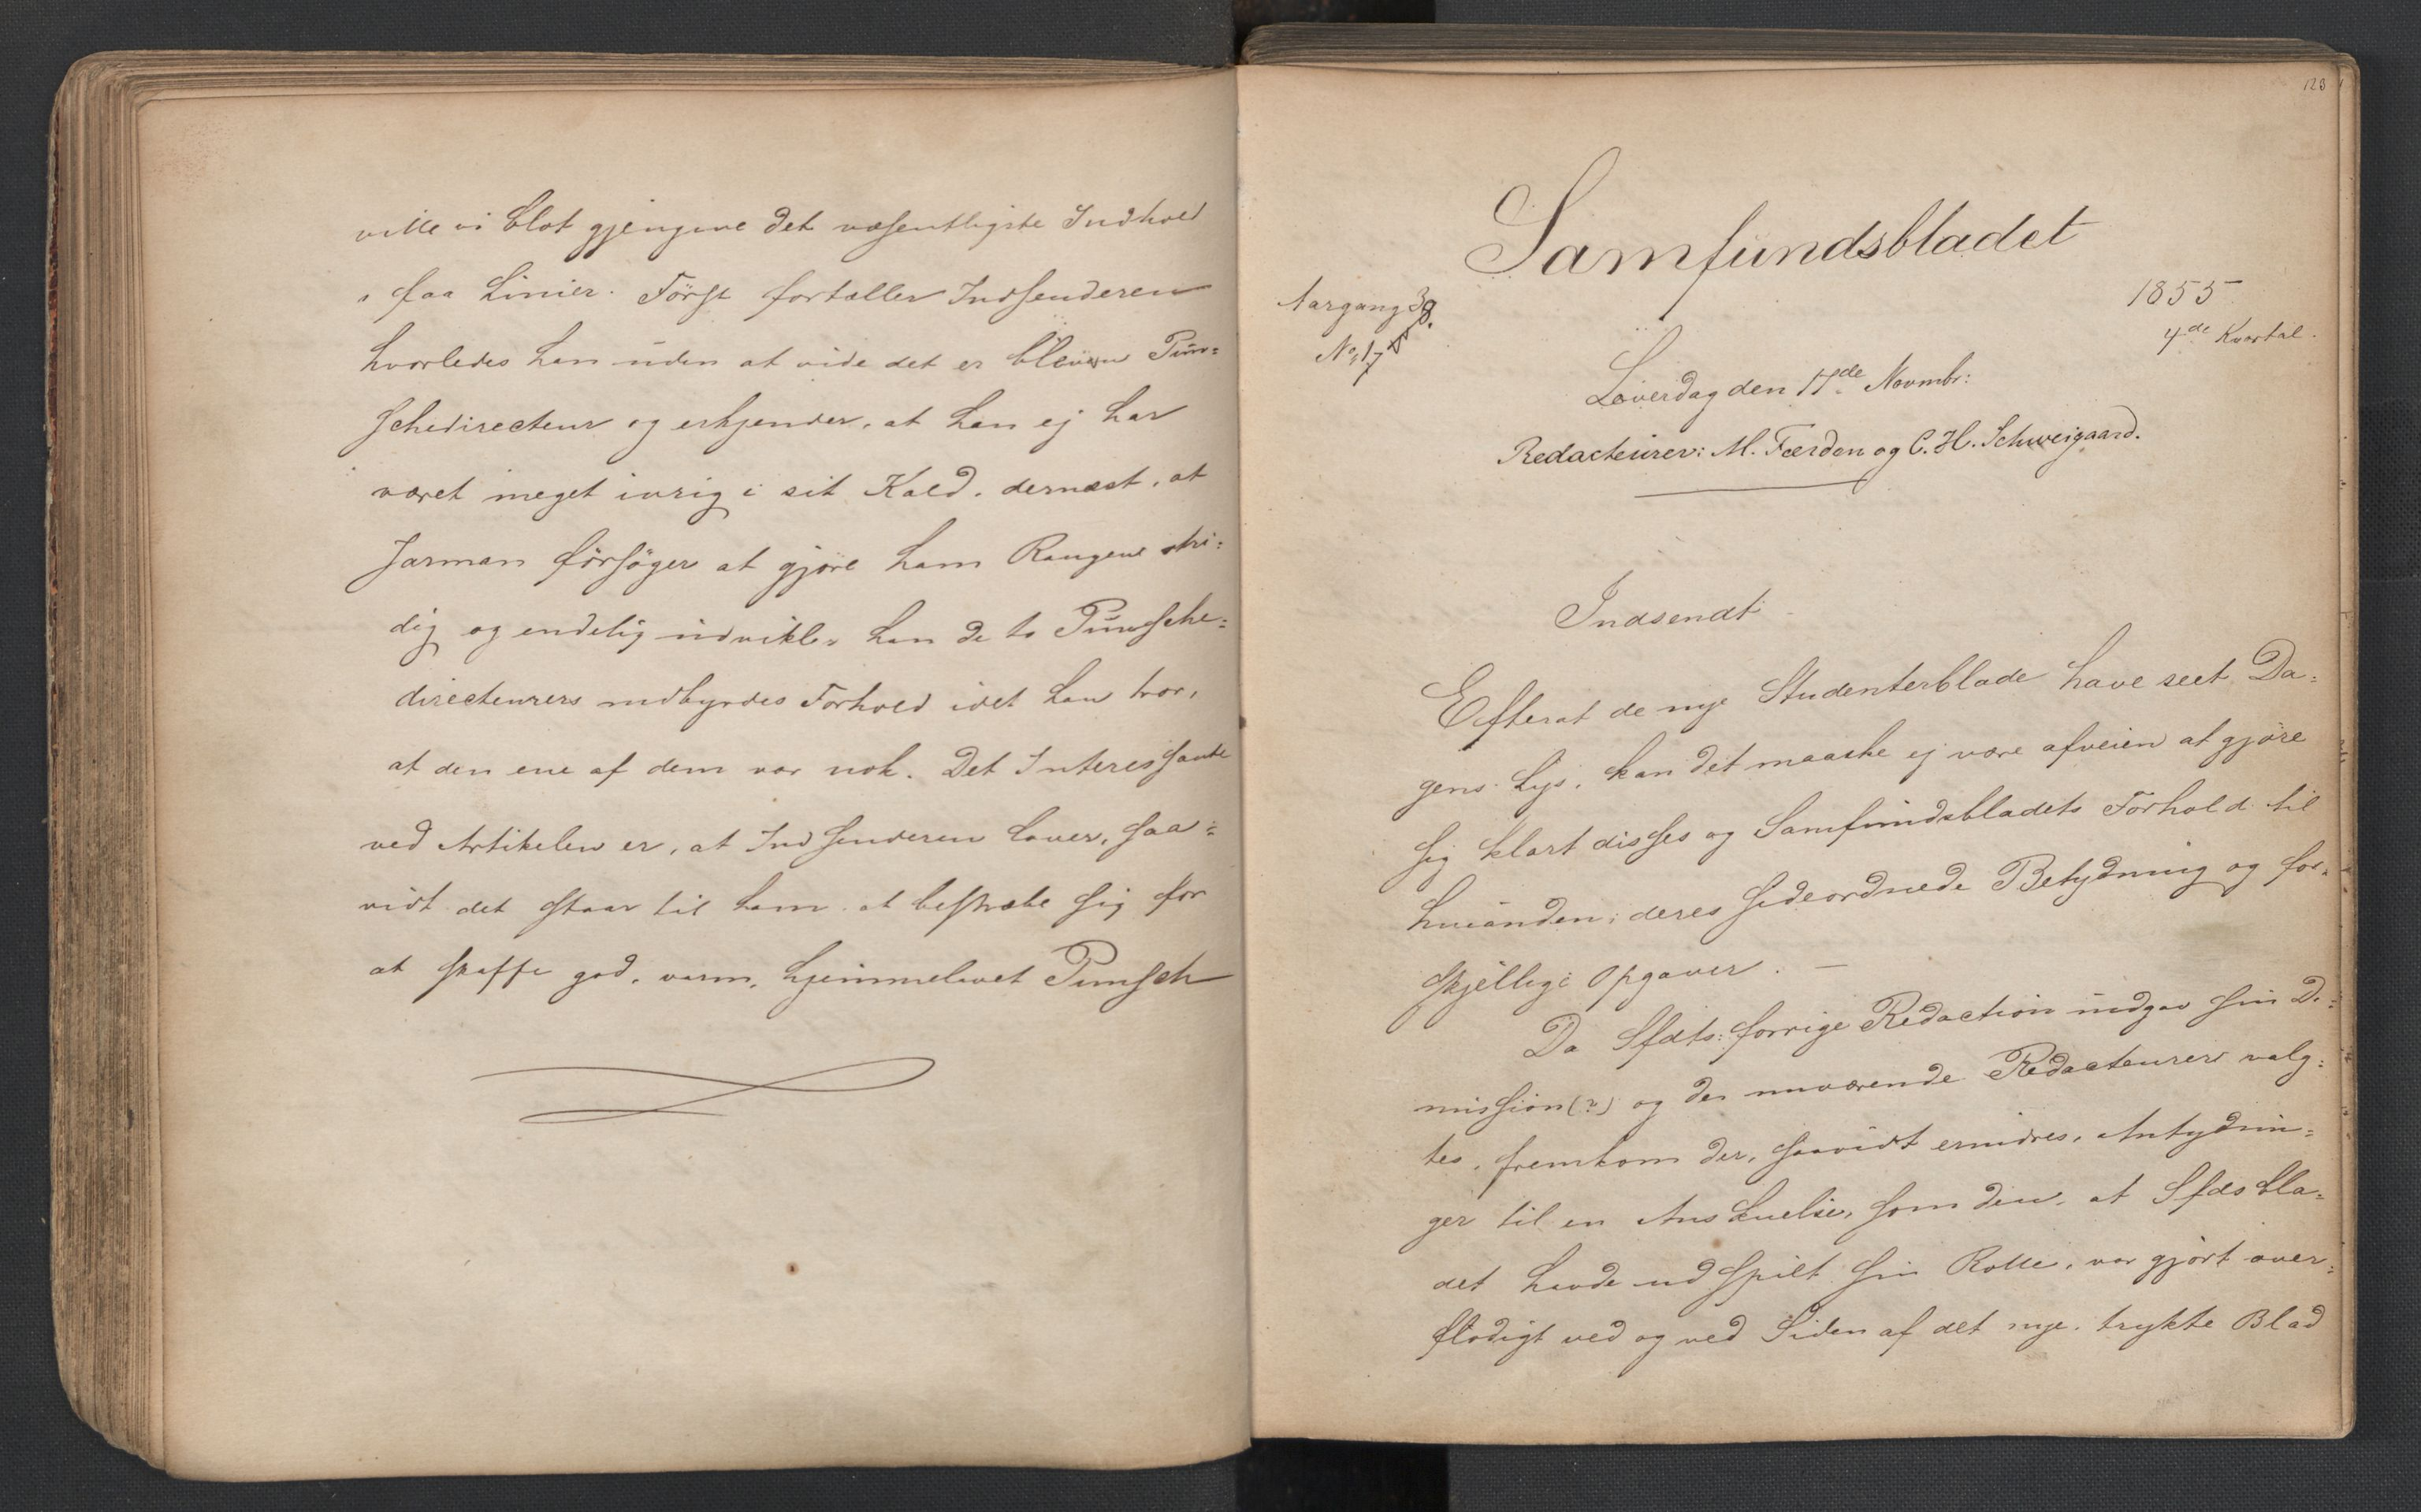 RA, Det Norske Studentersamfund, X/Xa/L0005, 1855-1856, s. 63